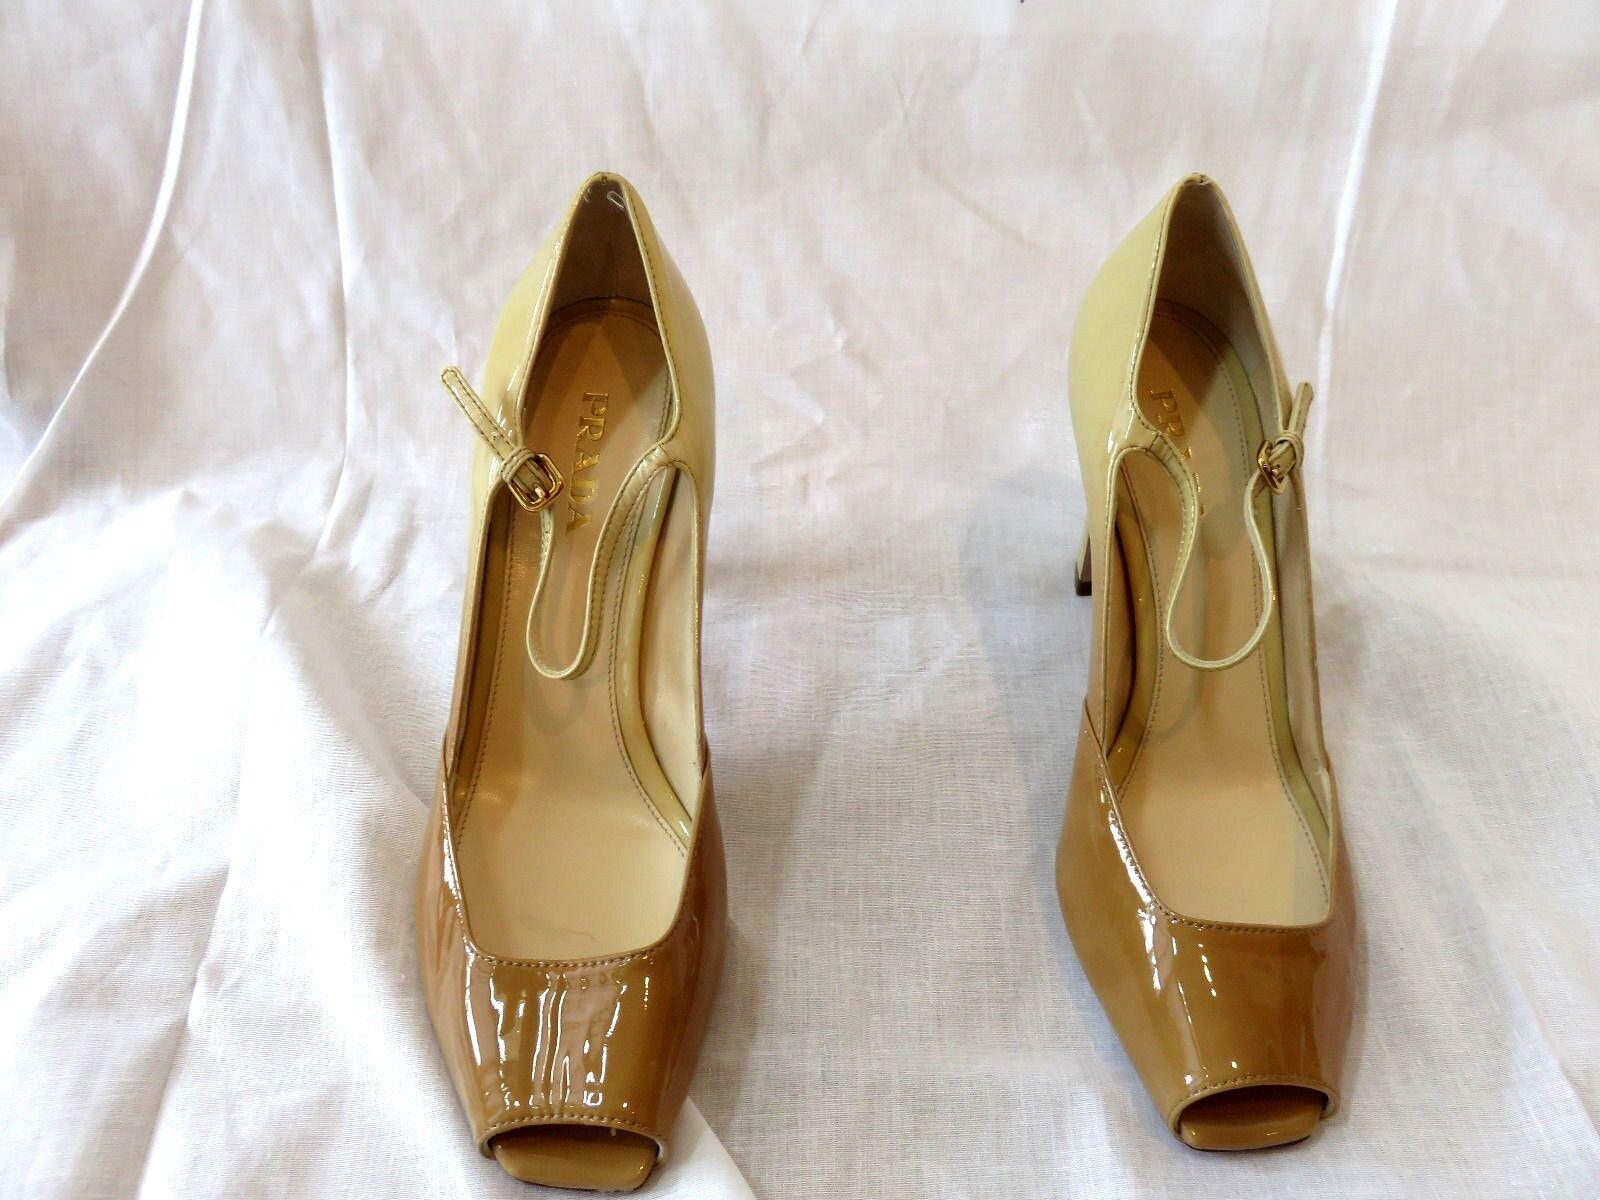 Prada  Beige Tan Patent Peep Toe Mary Jane Pump scarpe New Dimensione 39  8.5  sconto online